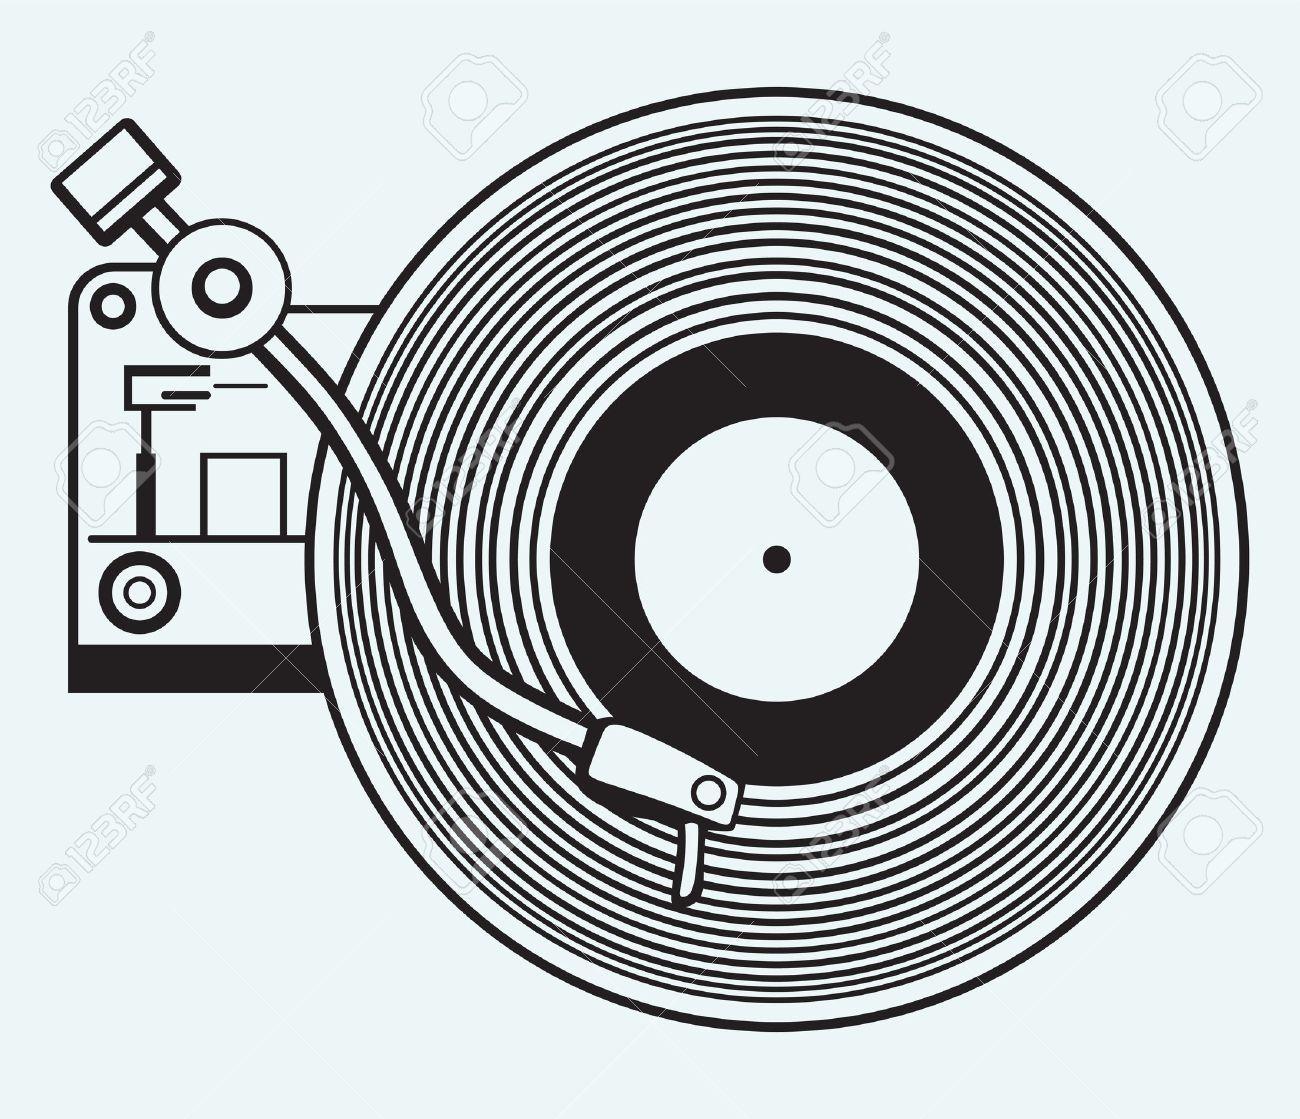 Stock Vector Vinyl record art, Record player tattoo, Vinyl